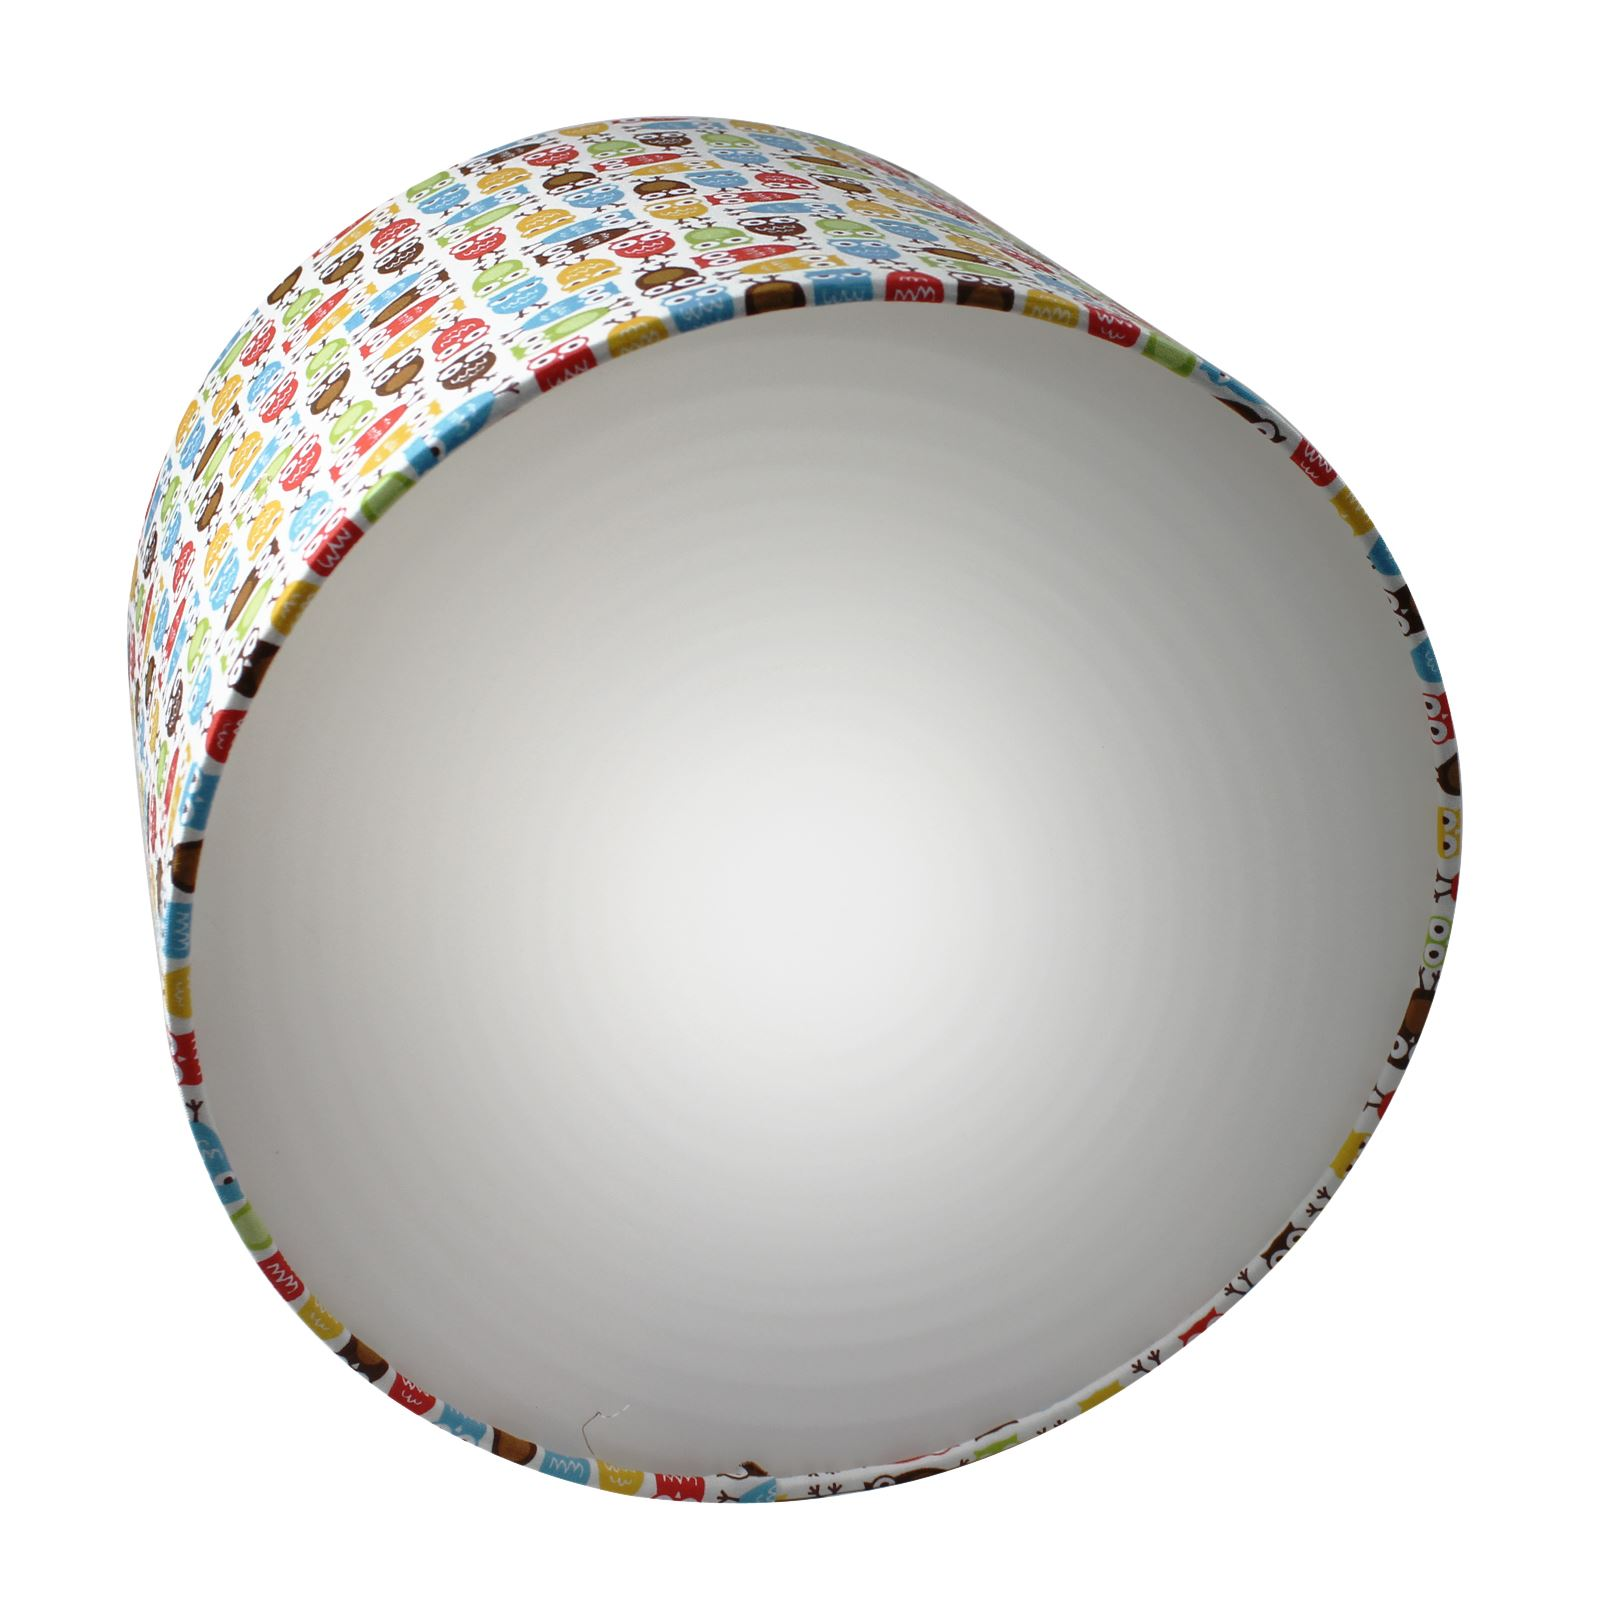 Haz-tu-propia-pantalla-diametro-30cm-KIT-de-Hagalo-usted-mismo-pantalla-haciendo-por-needcraft miniatura 17